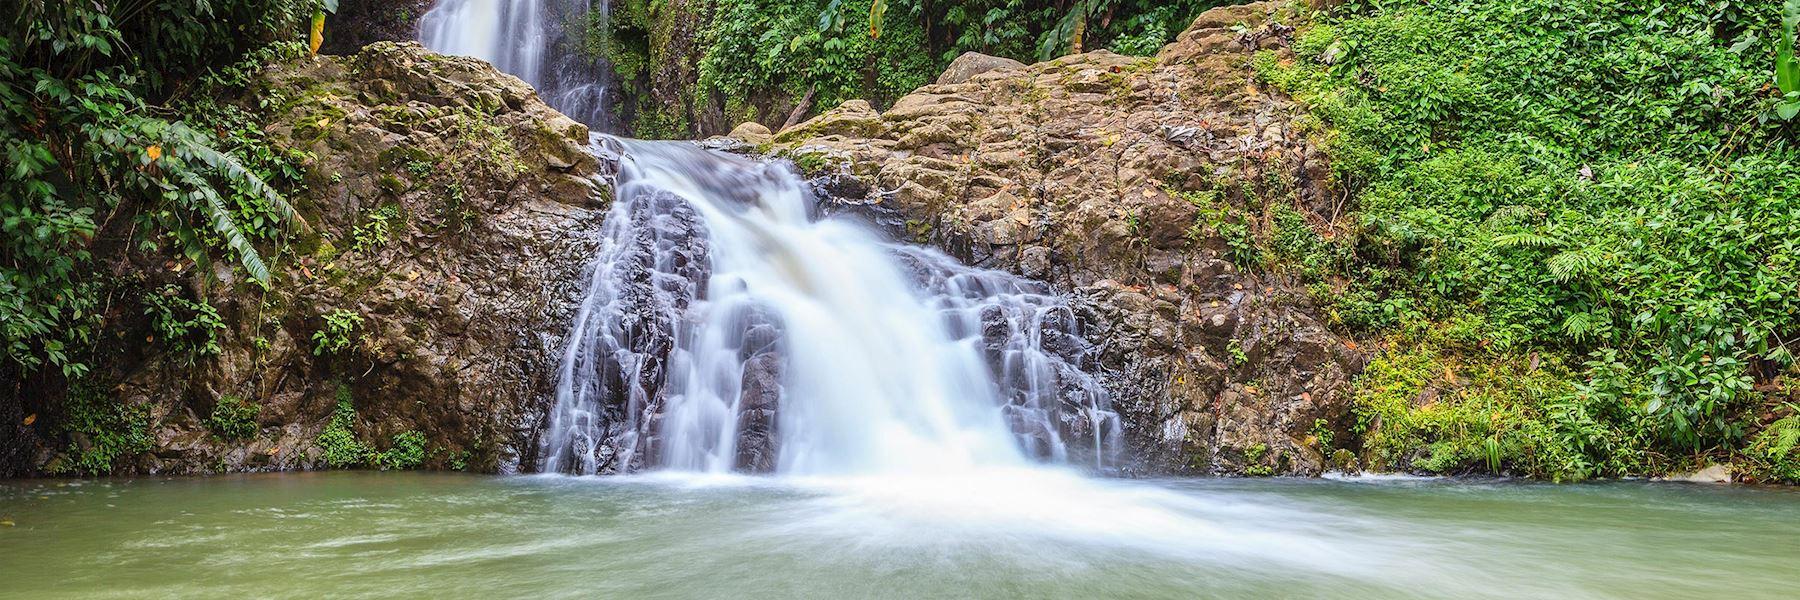 Grenada travel guides